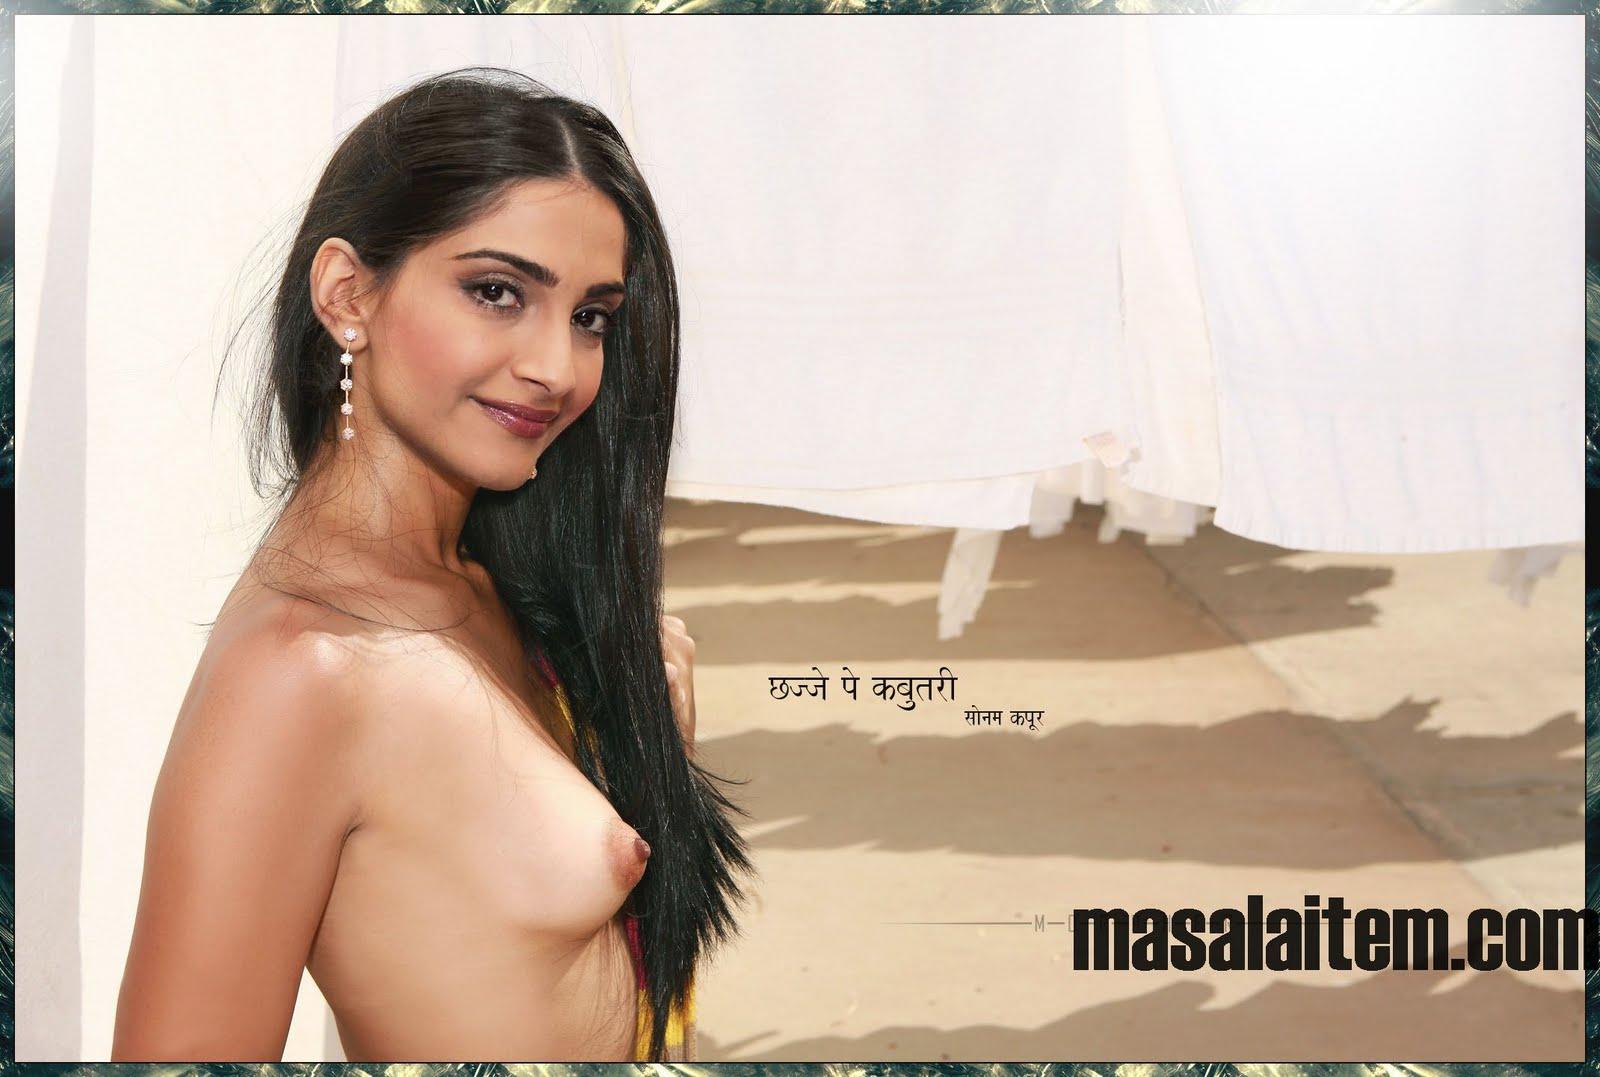 Nude Photo Of Sonam